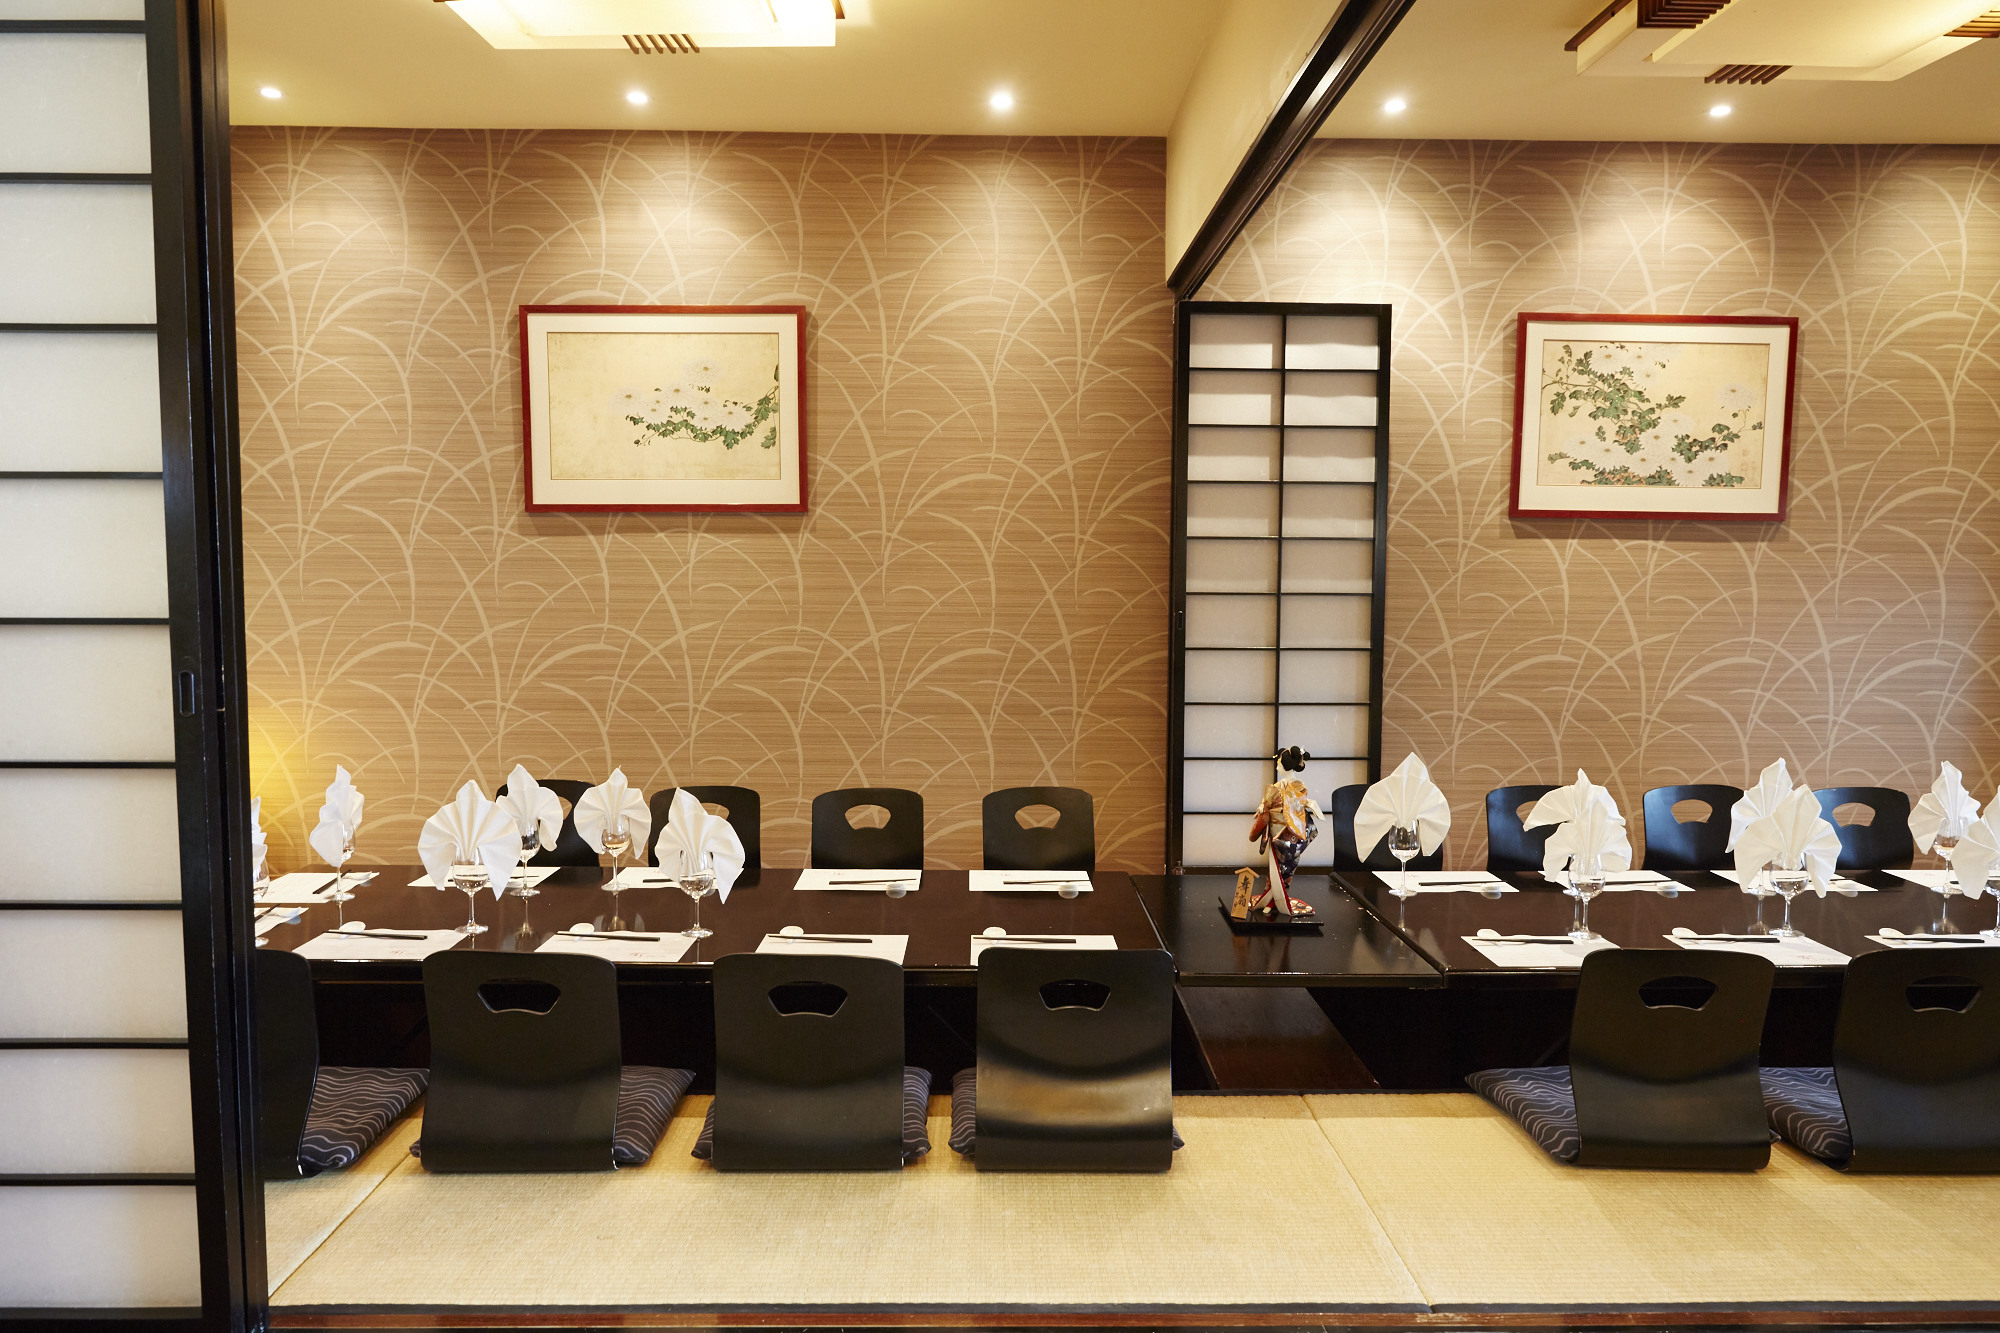 Southgate Melbourne Restaurants Miyako Southgate  : SouthbankDay42328 from southgatemelbourne.com.au size 2000 x 1333 jpeg 708kB